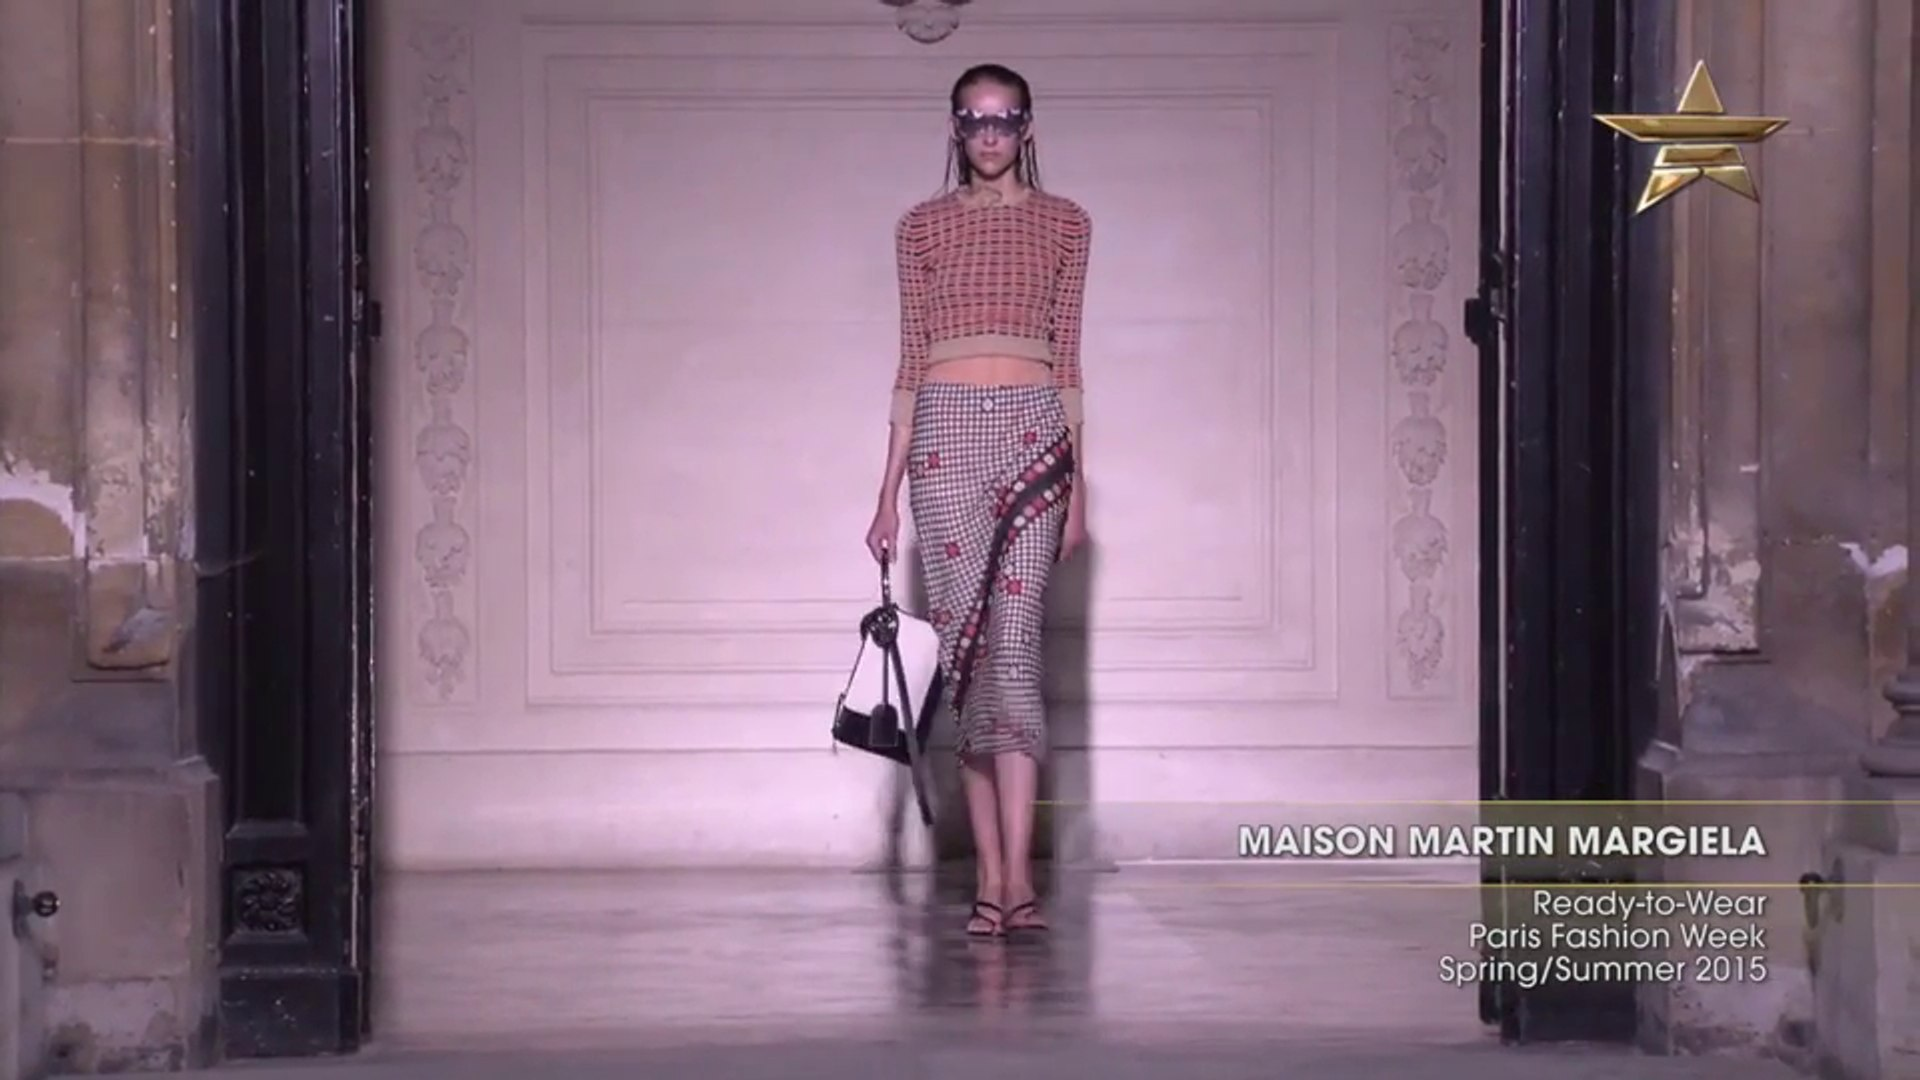 Fashion Week From The Runway Maison Martin Margiela Ready To Wear Paris Fashion Week Spring Summer 2015